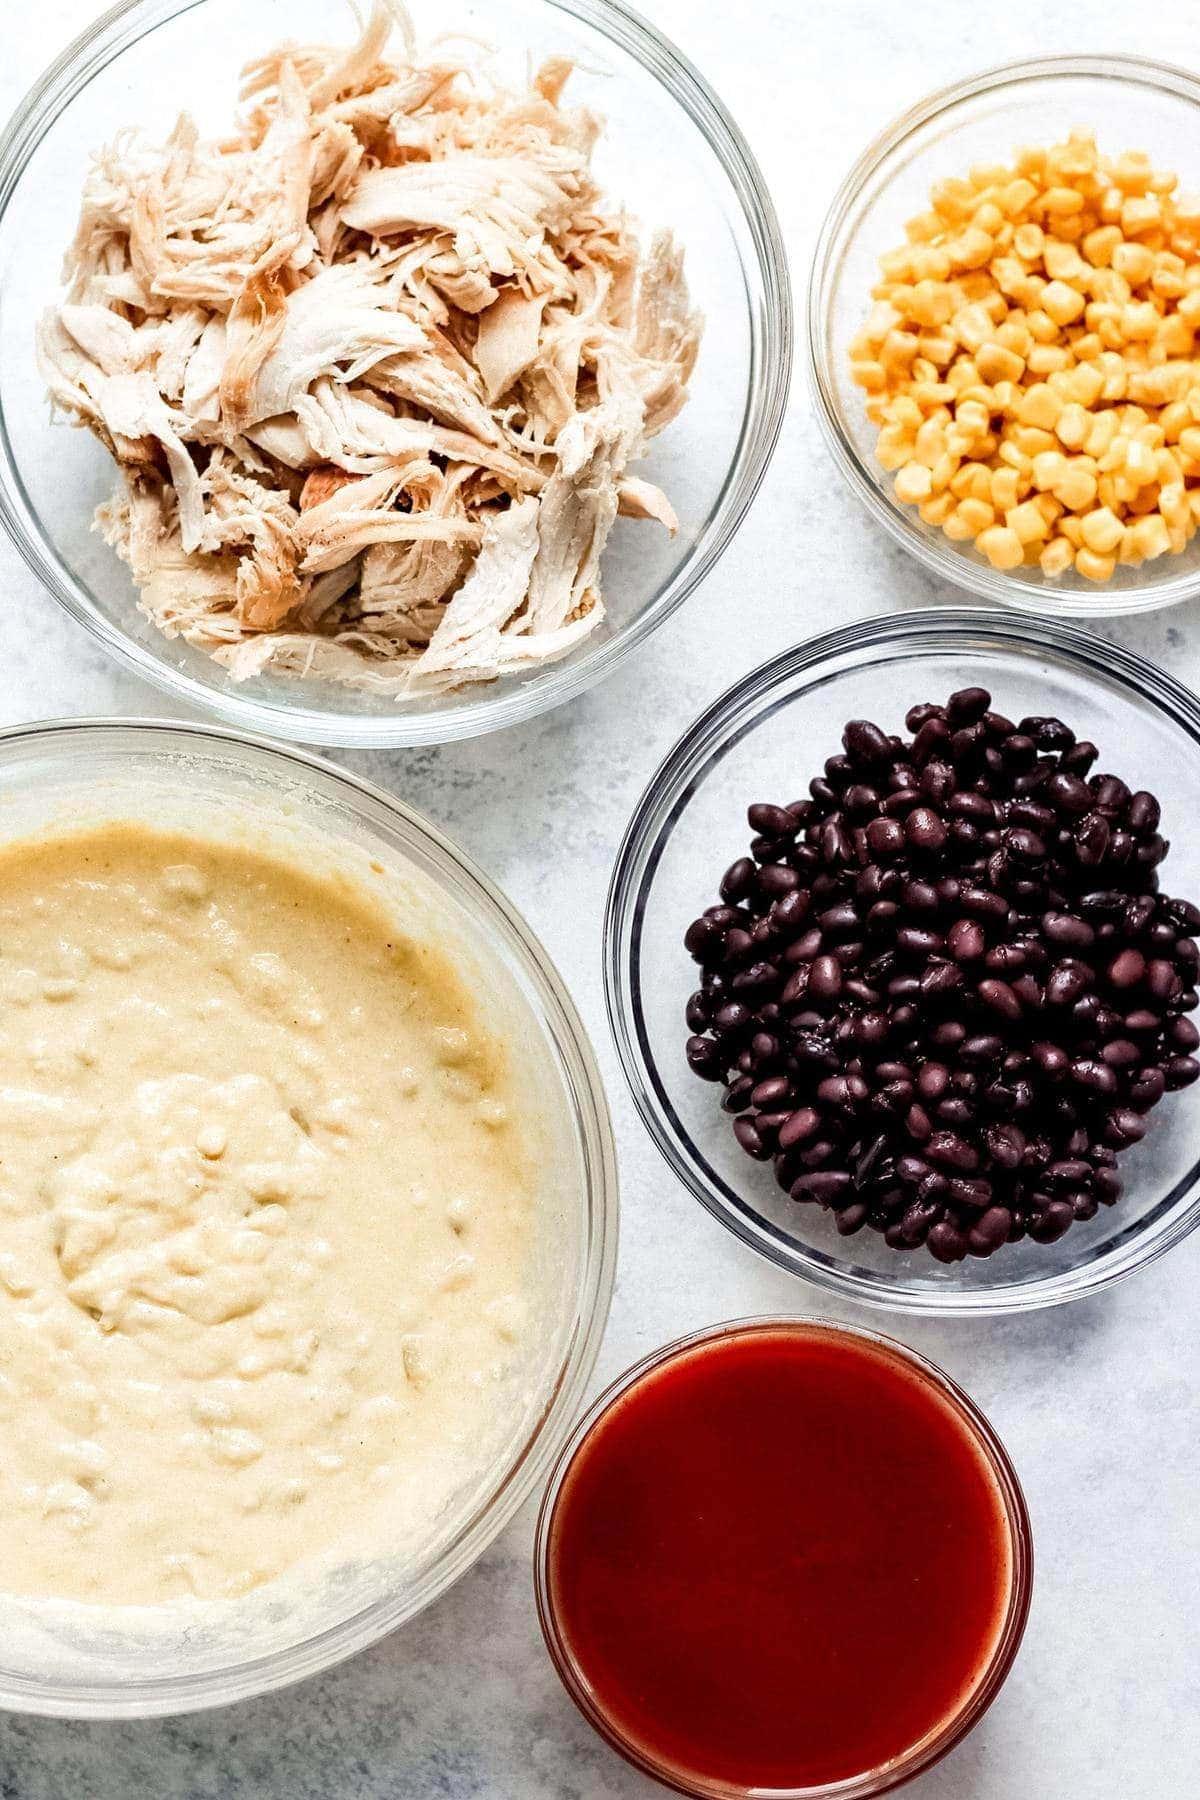 ingredients for chicken tamale casserole